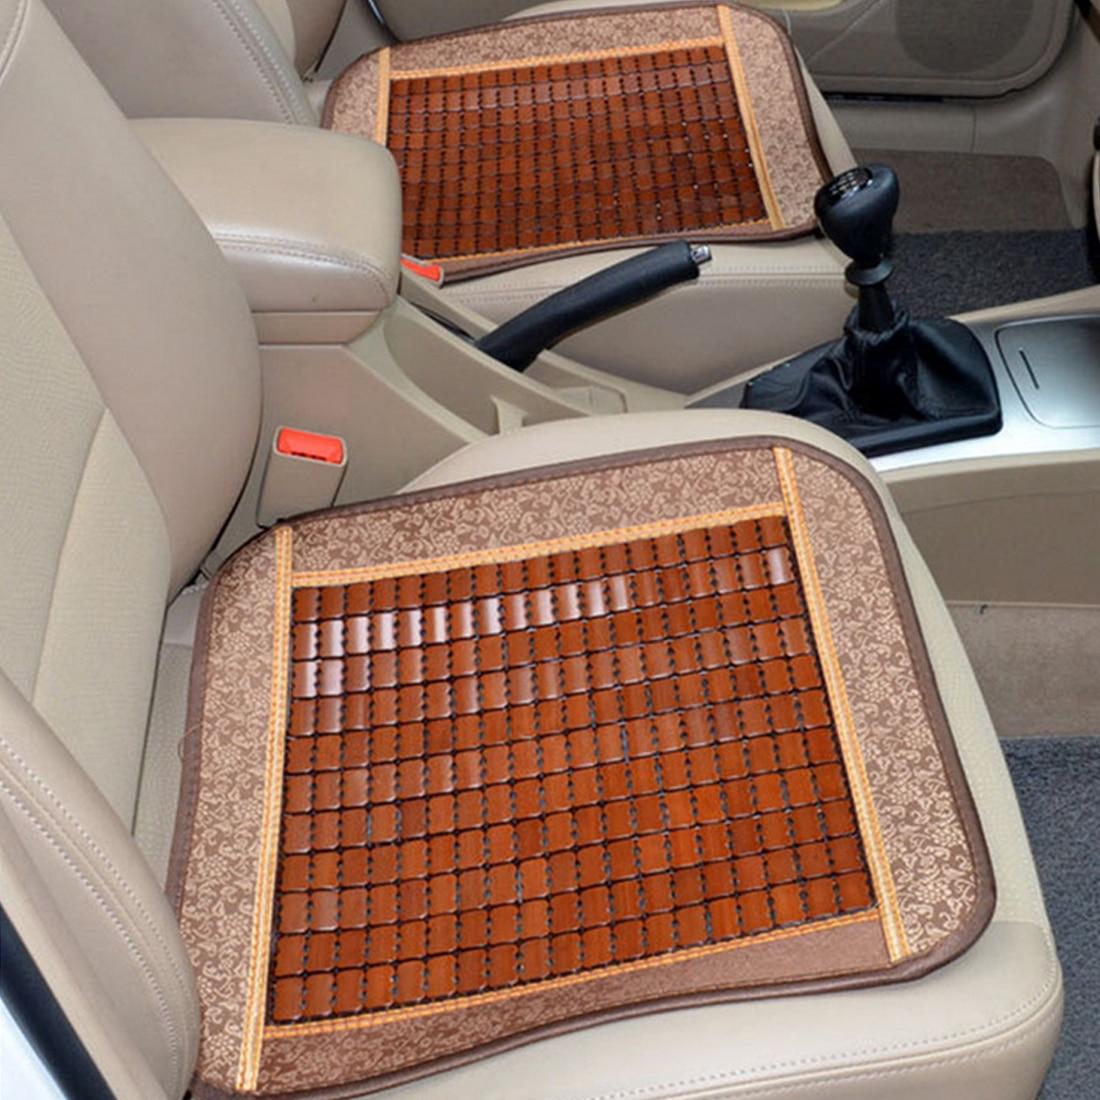 Dewtreetali Bamboo car seat cushion wood beads Square General cover summer ventilation